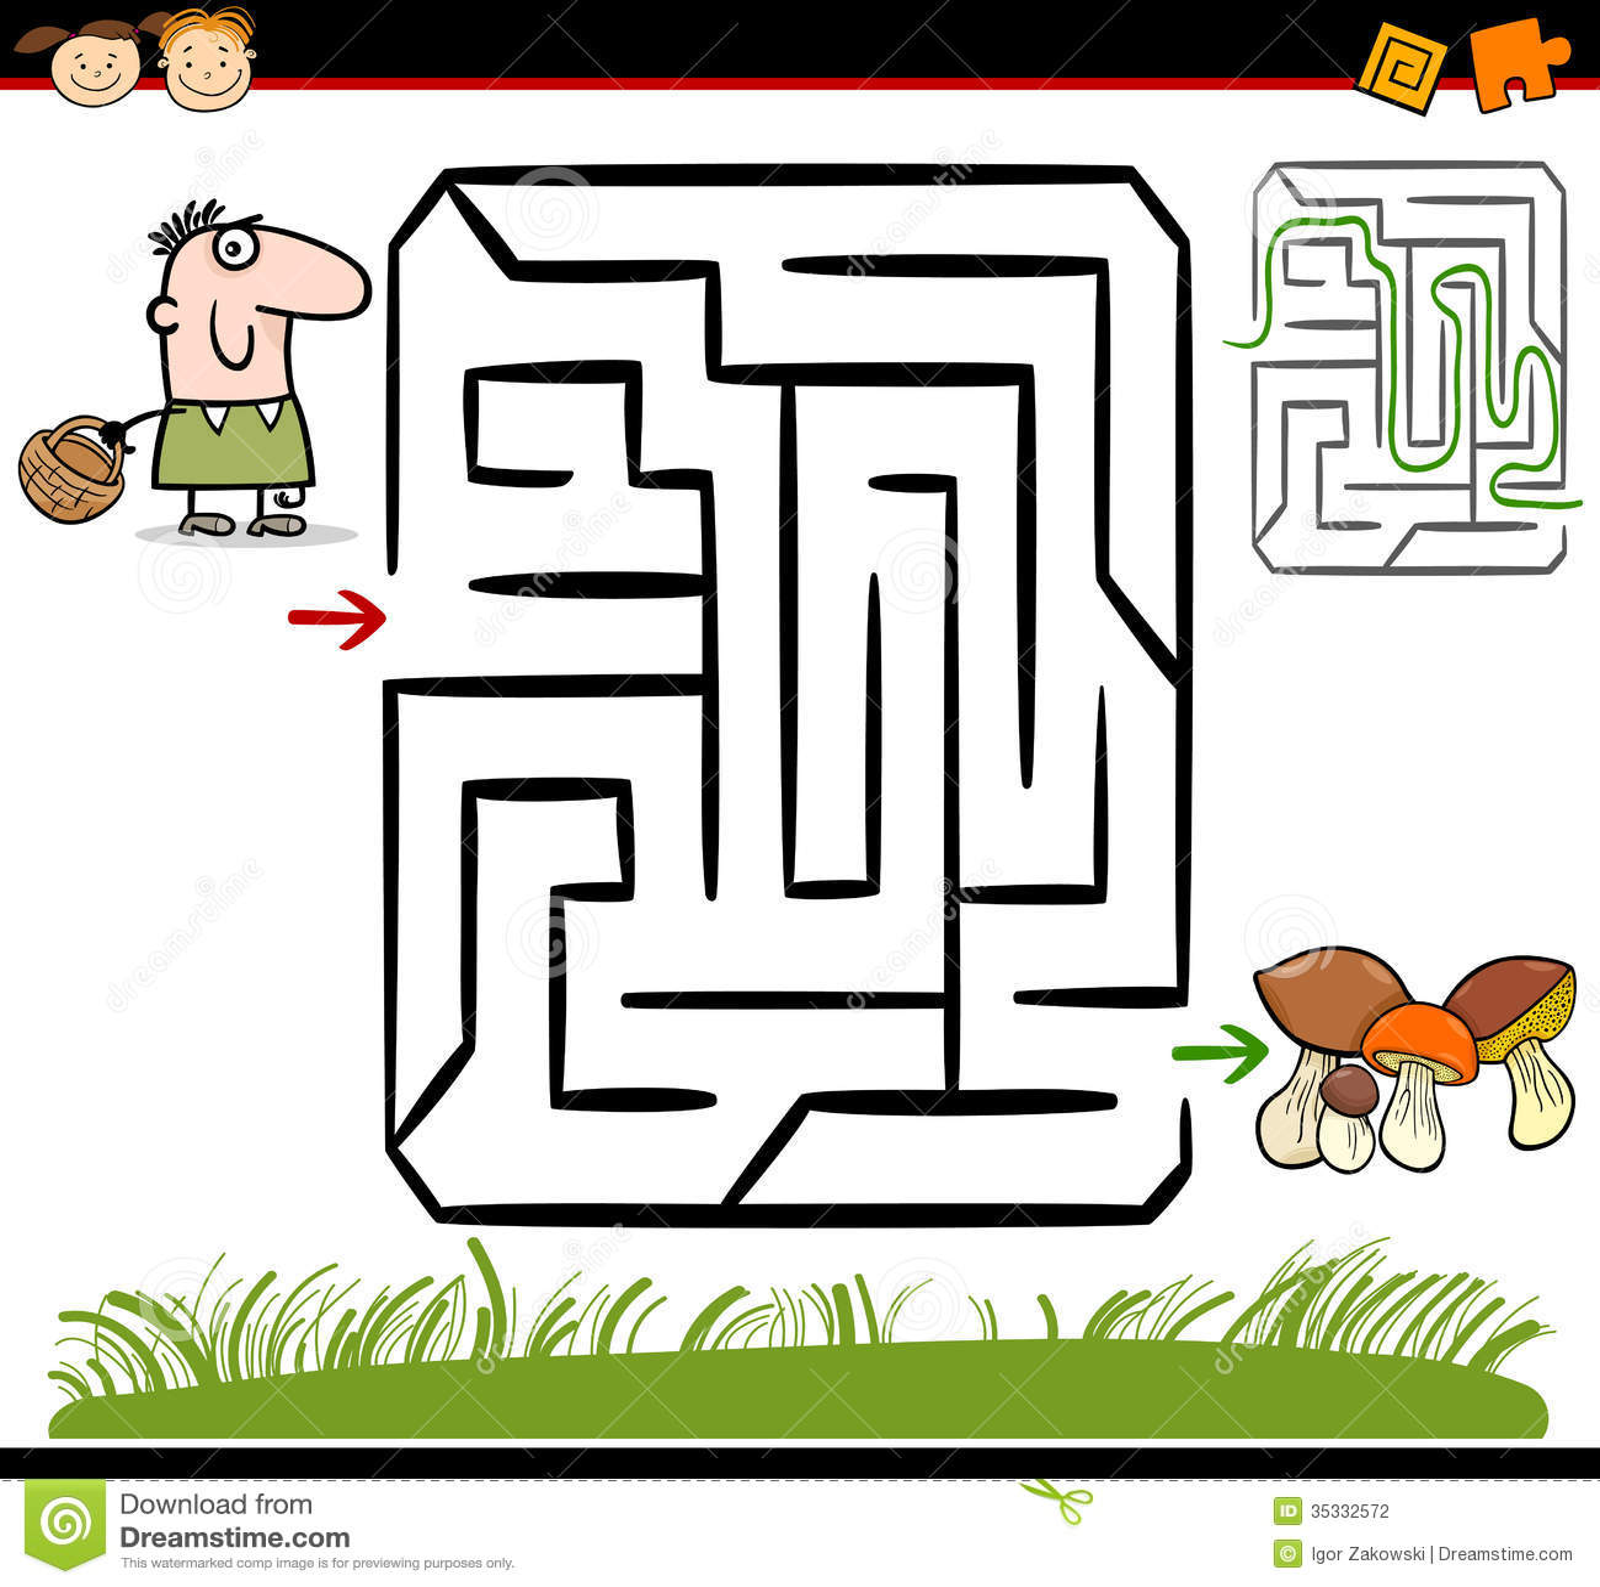 Stock Photography Cartoon Maze Labyrinth Game Illustration Education Preschool Children Funny Man Basket Mushrooms Image35332572 on Ant Preschool Worksheets